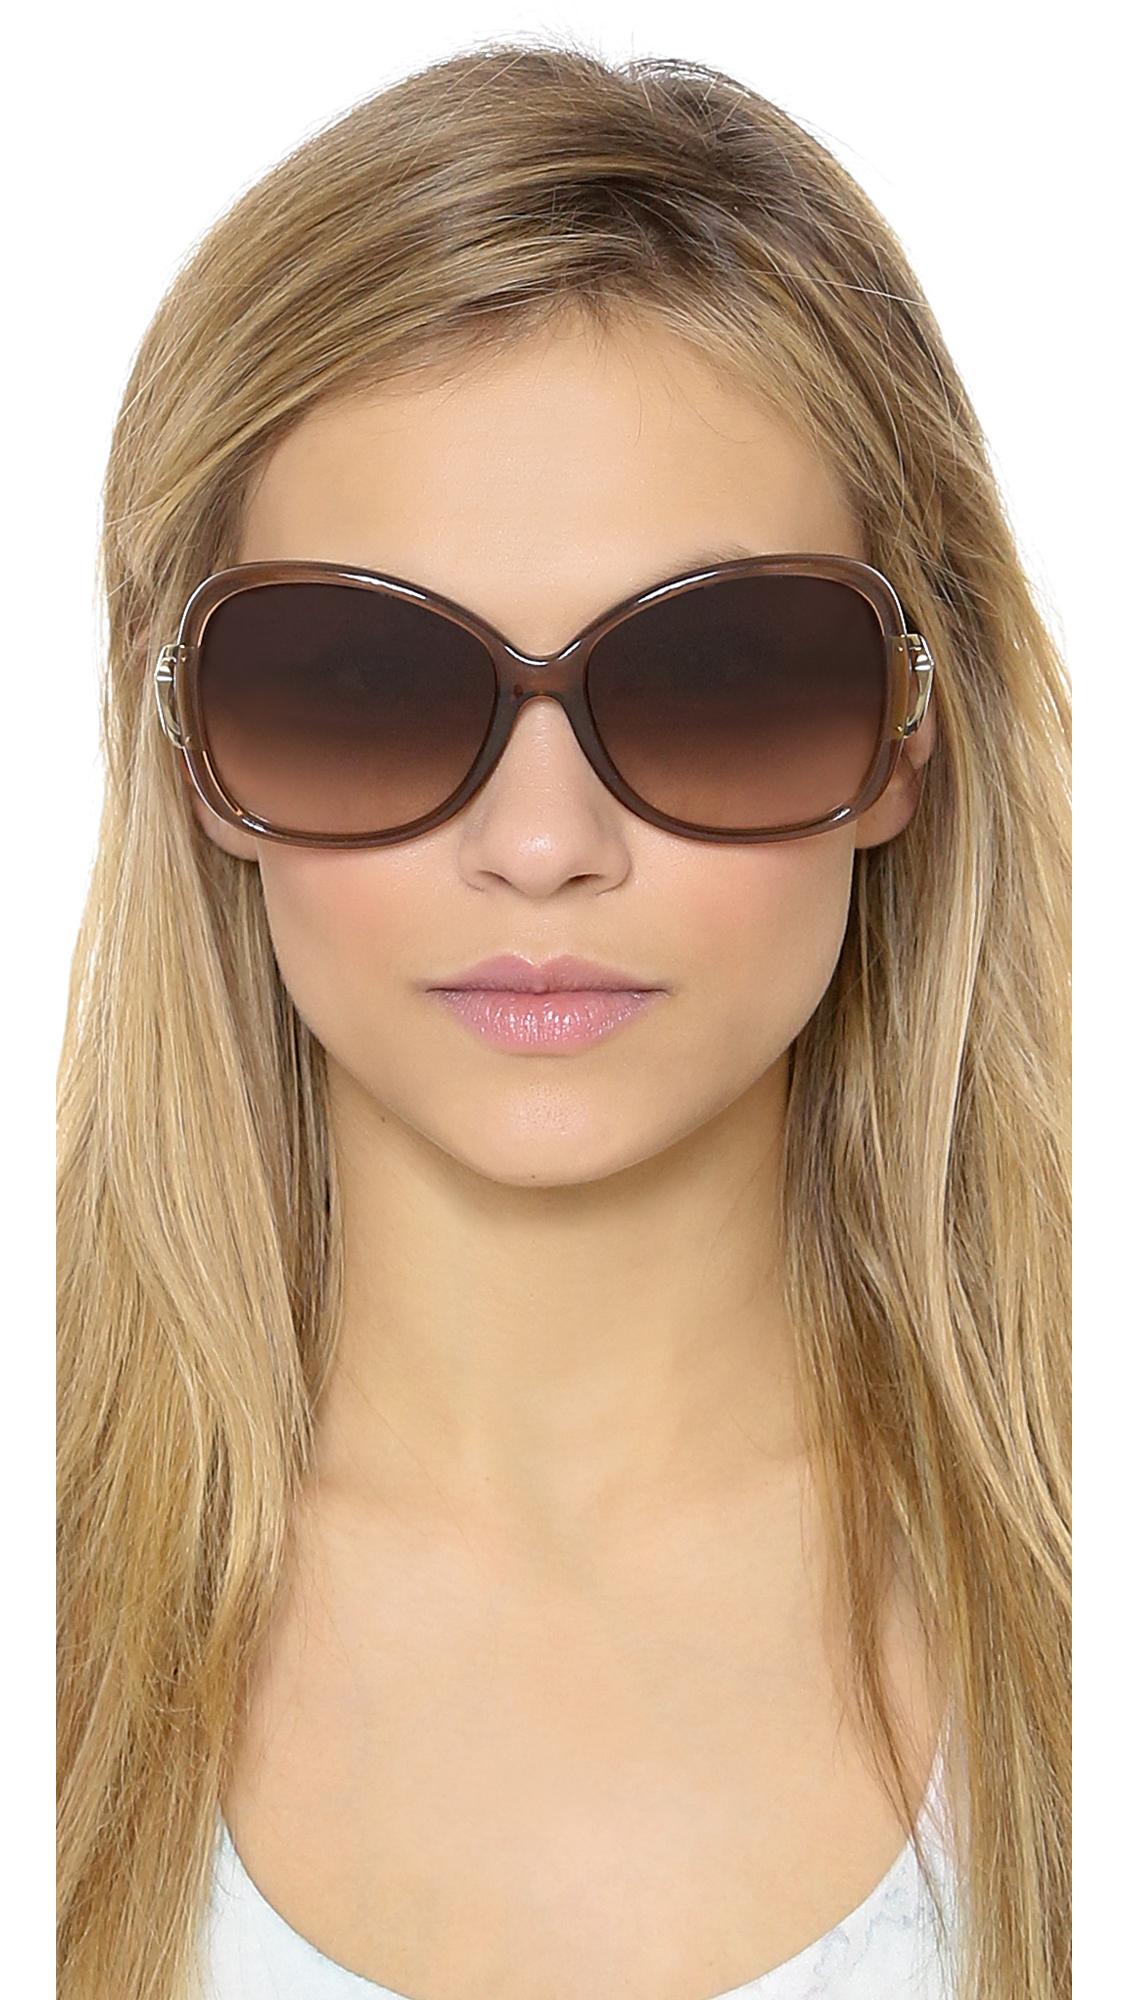 fd1ae134ff Lyst - Michael Kors Bora Bora Sunglasses - Black grey Gradient in Brown